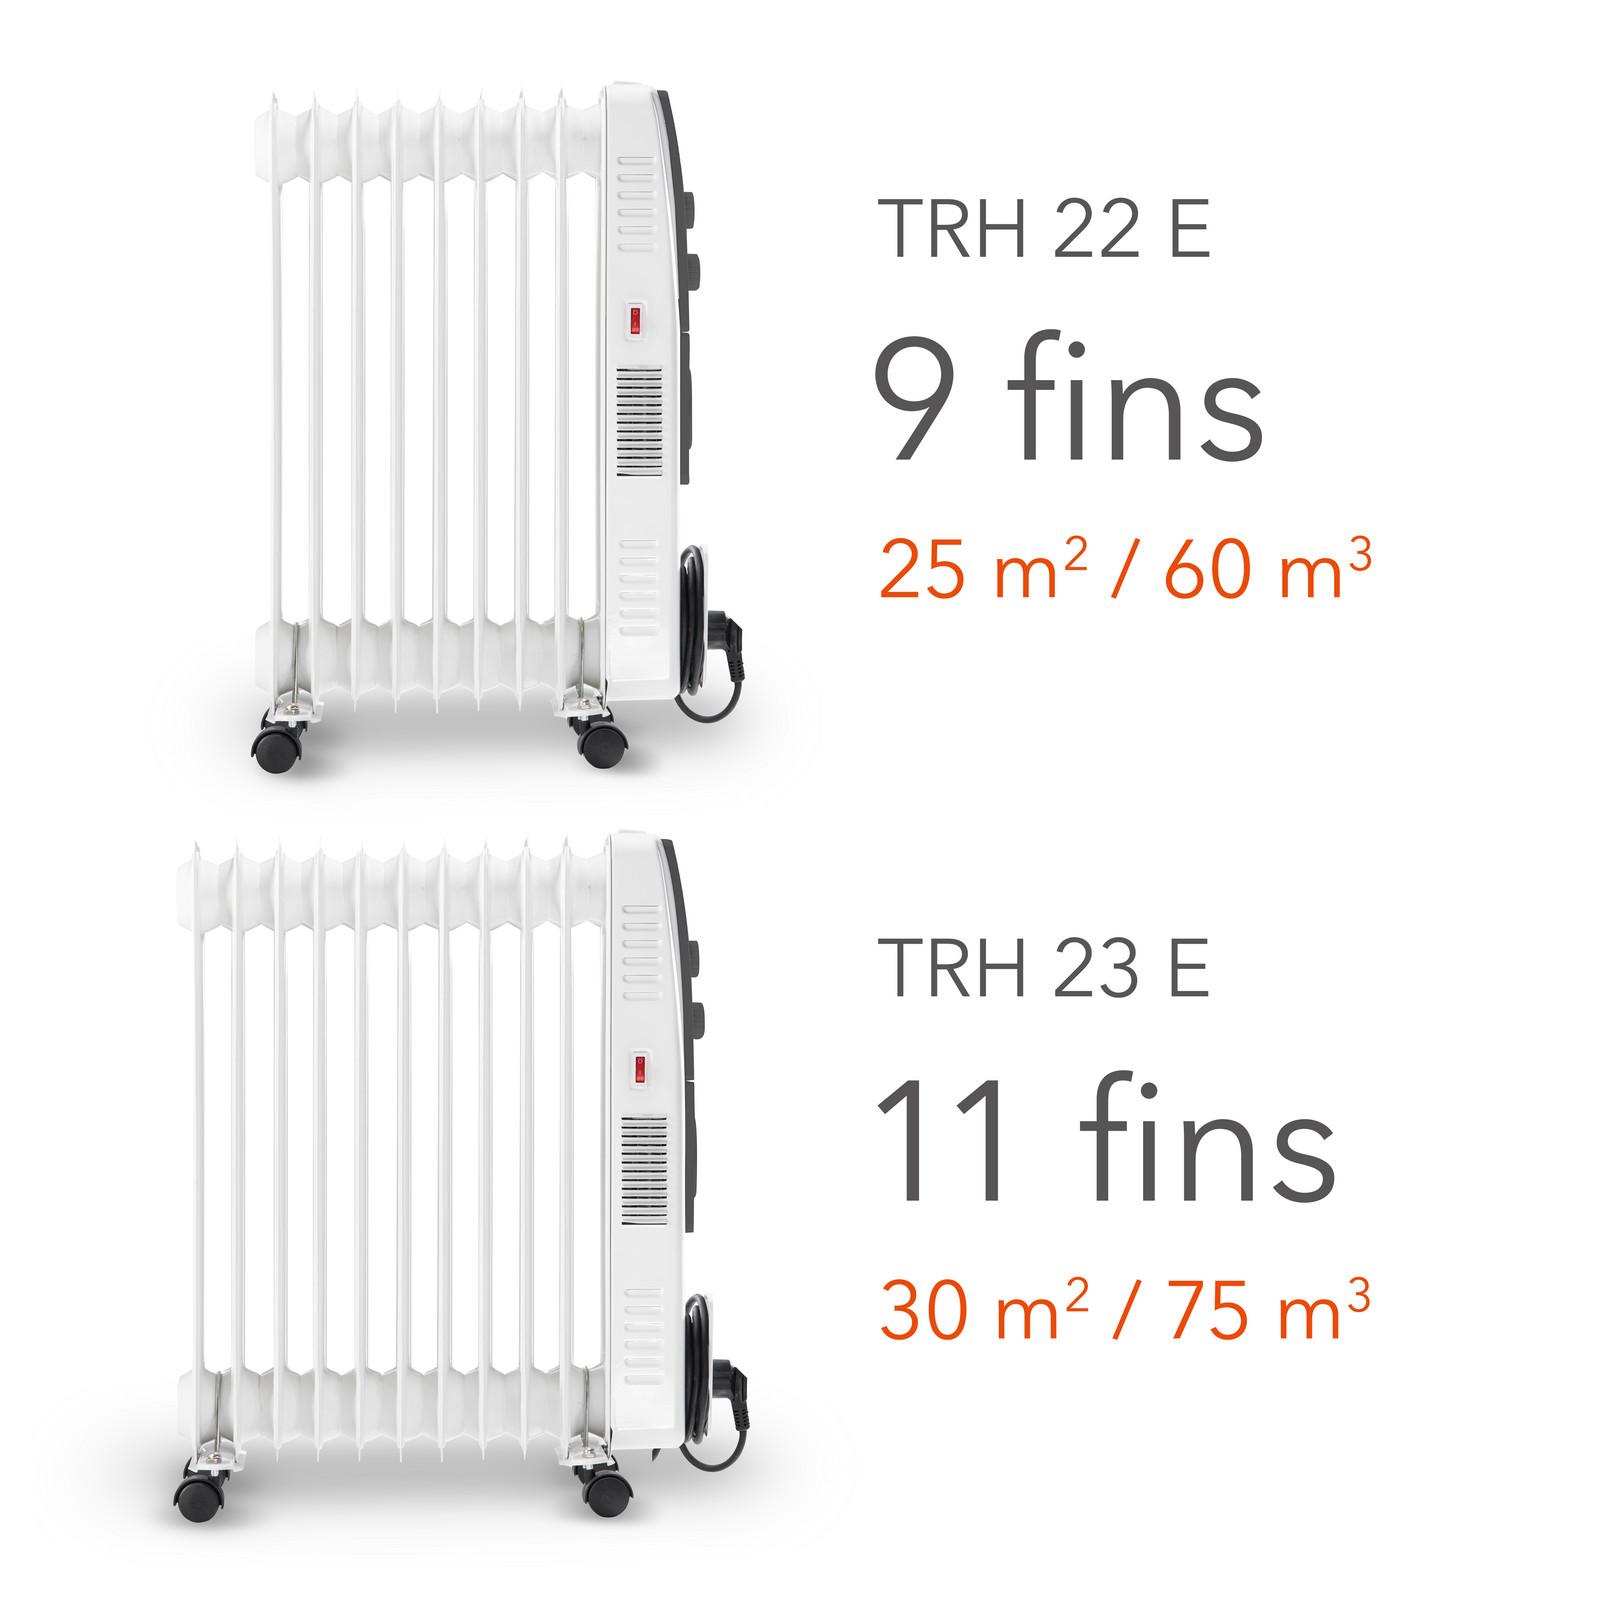 Масляные радиаторы TRH 22 E / TRH 23 E - количество ребер